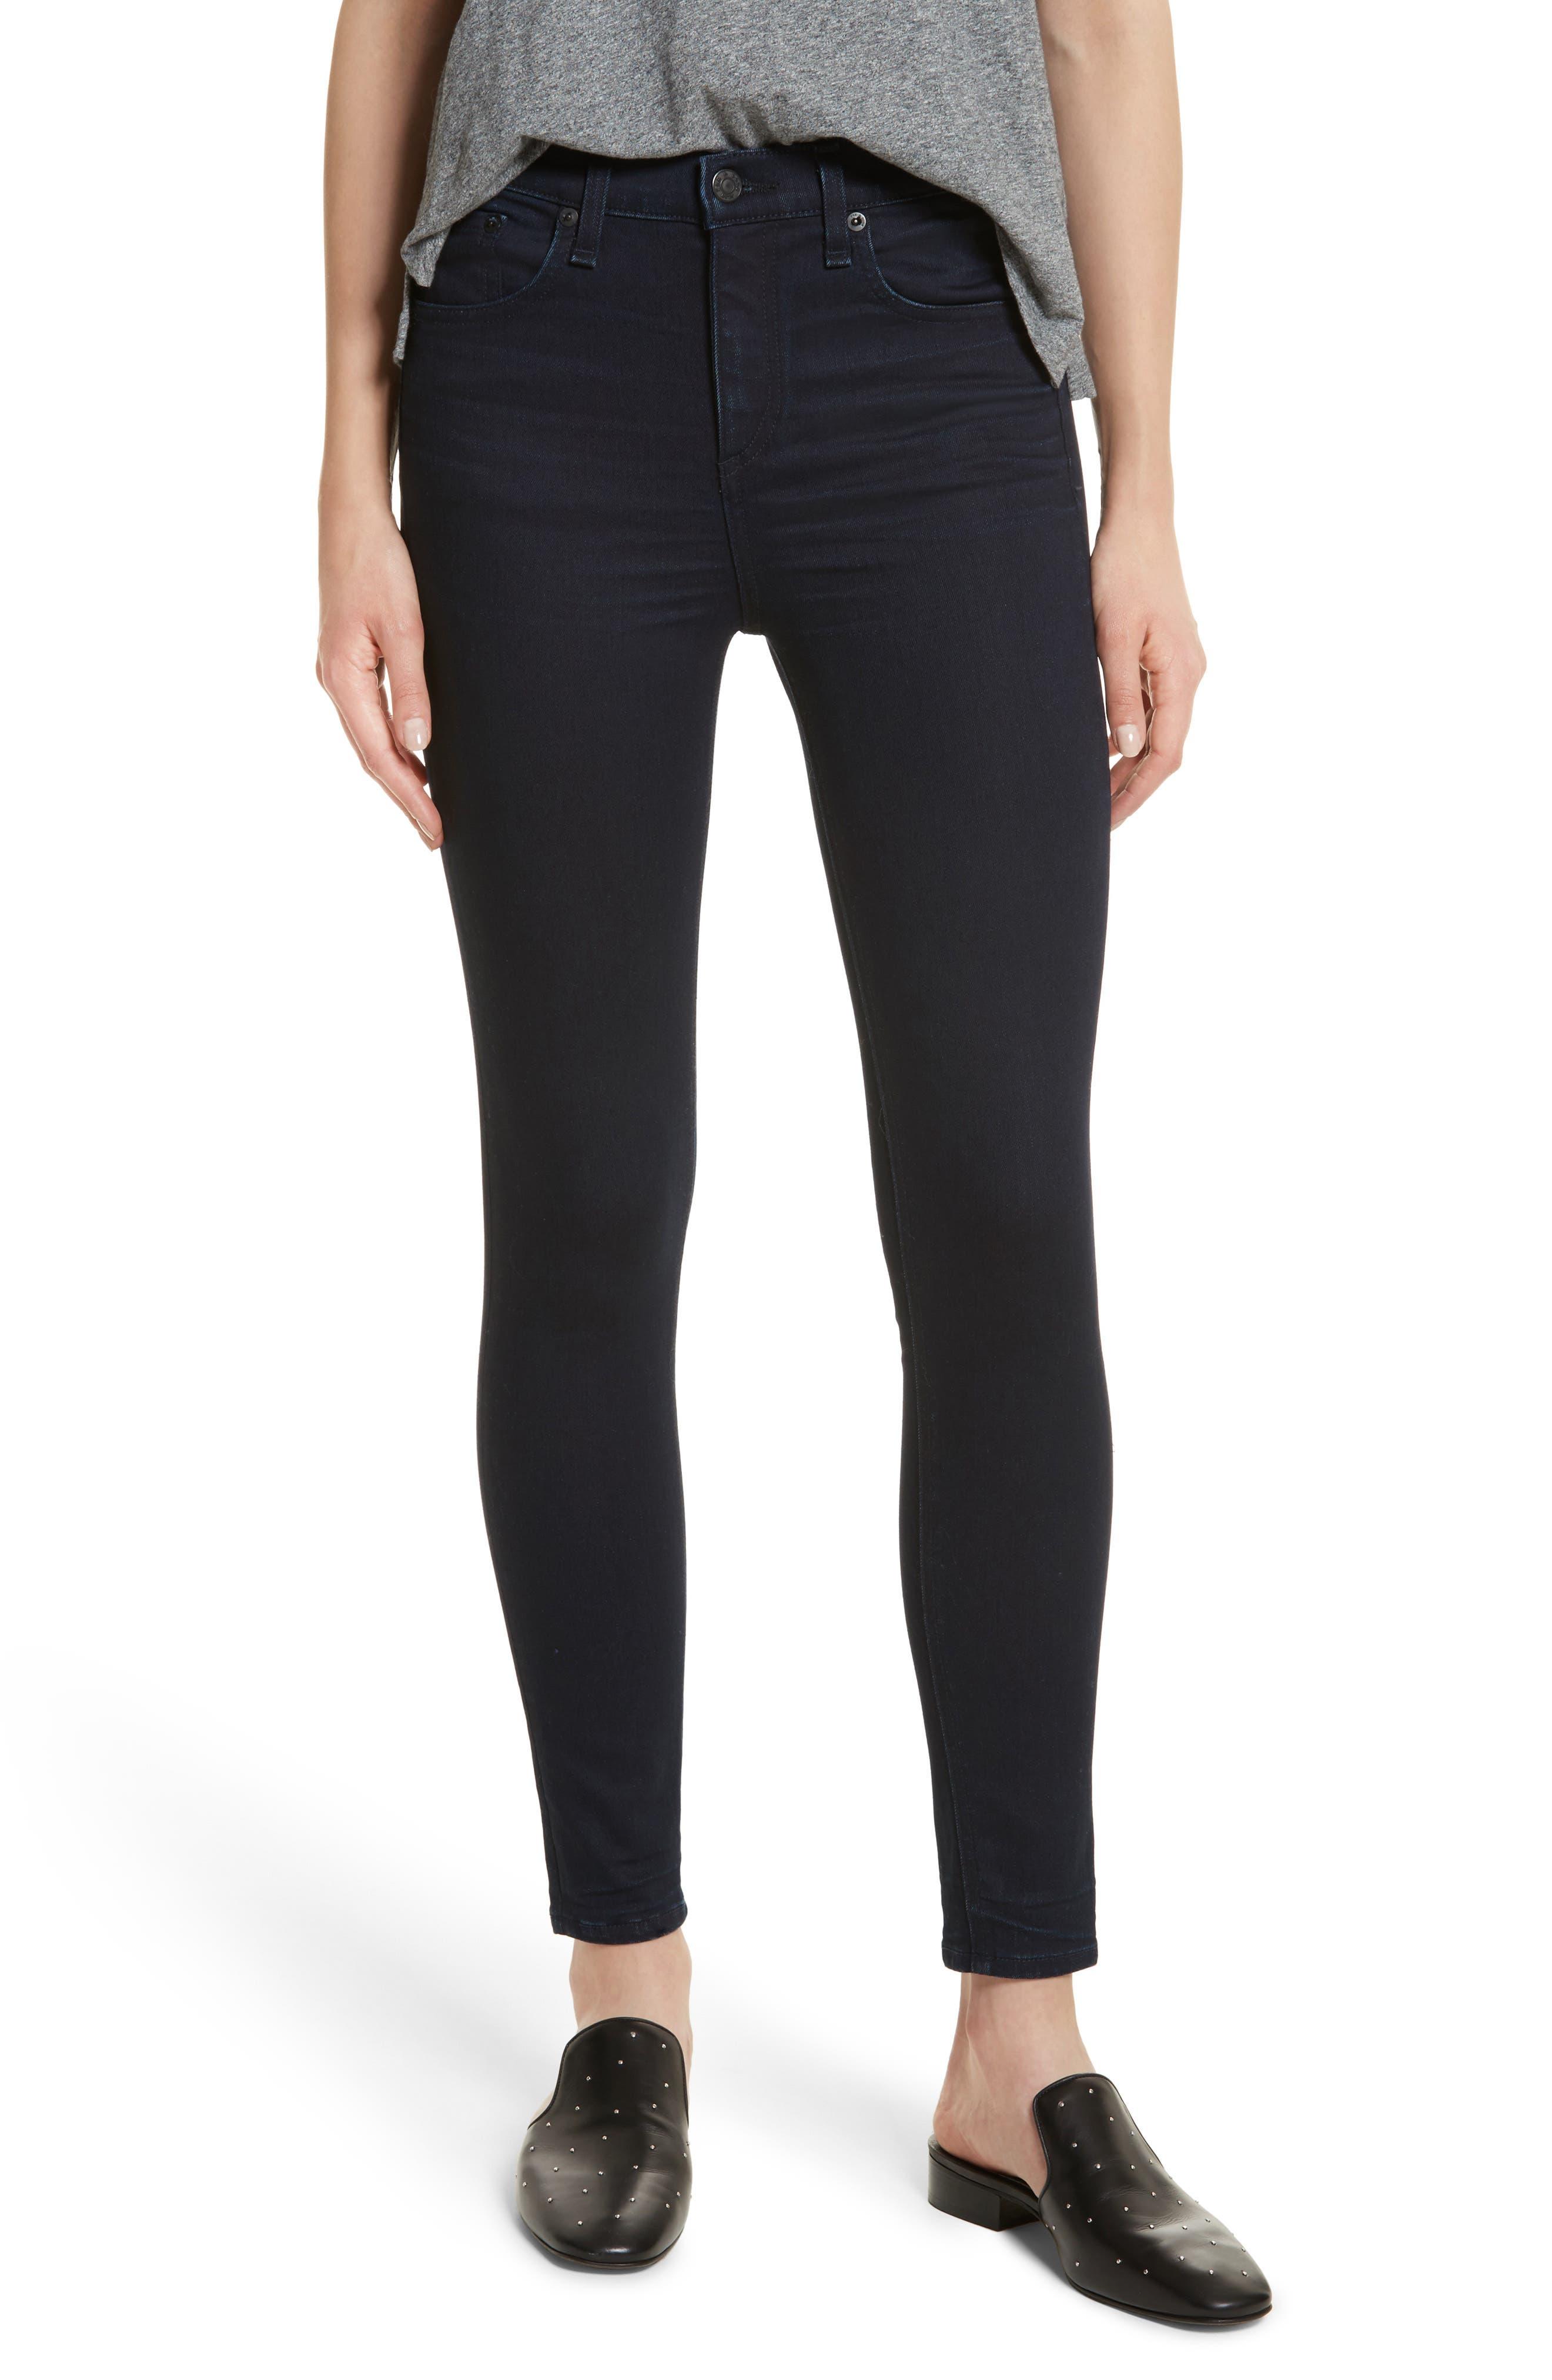 RAG & BONE JEAN High Waist Ankle Skinny Jeans, Main, color, 001